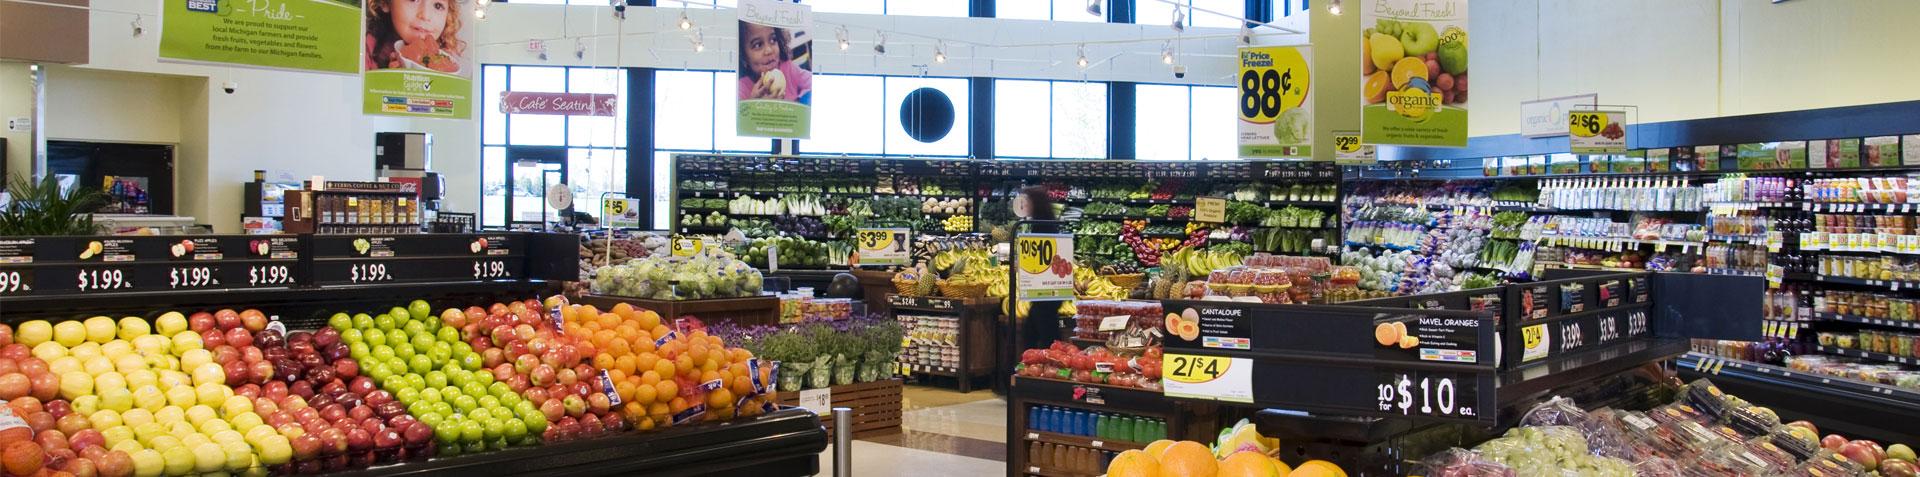 Grocery Distributor and Retailer - SpartanNash Company